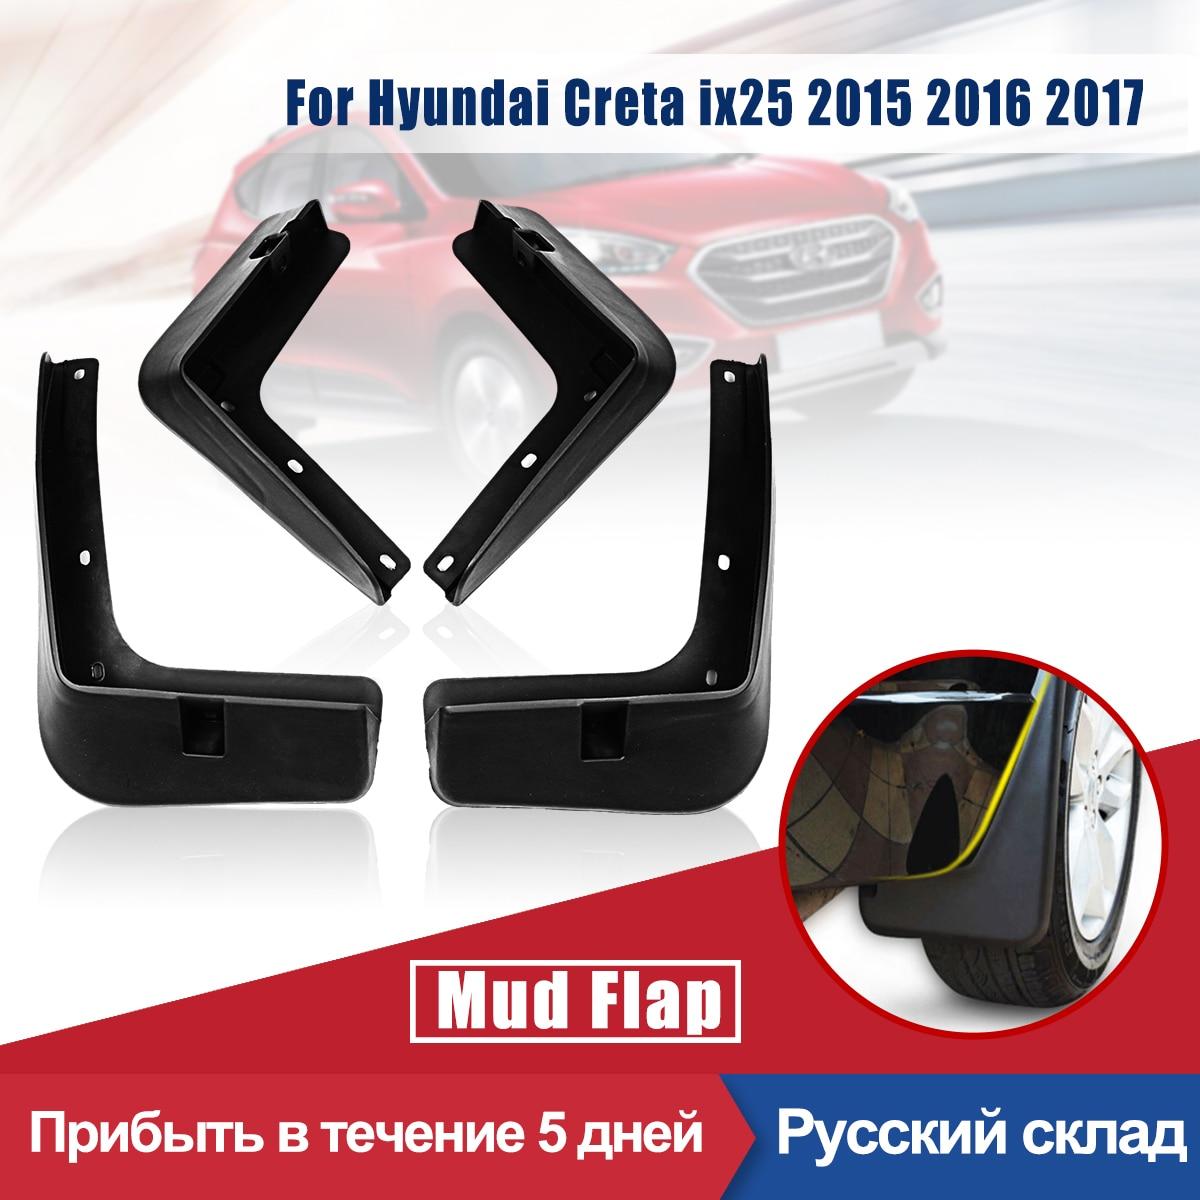 4Pcs Car Front Rear Mudguards Splash Guards Fender Flares Mud Flaps For Hyundai Creta ix25 2015 2016 2017 2018